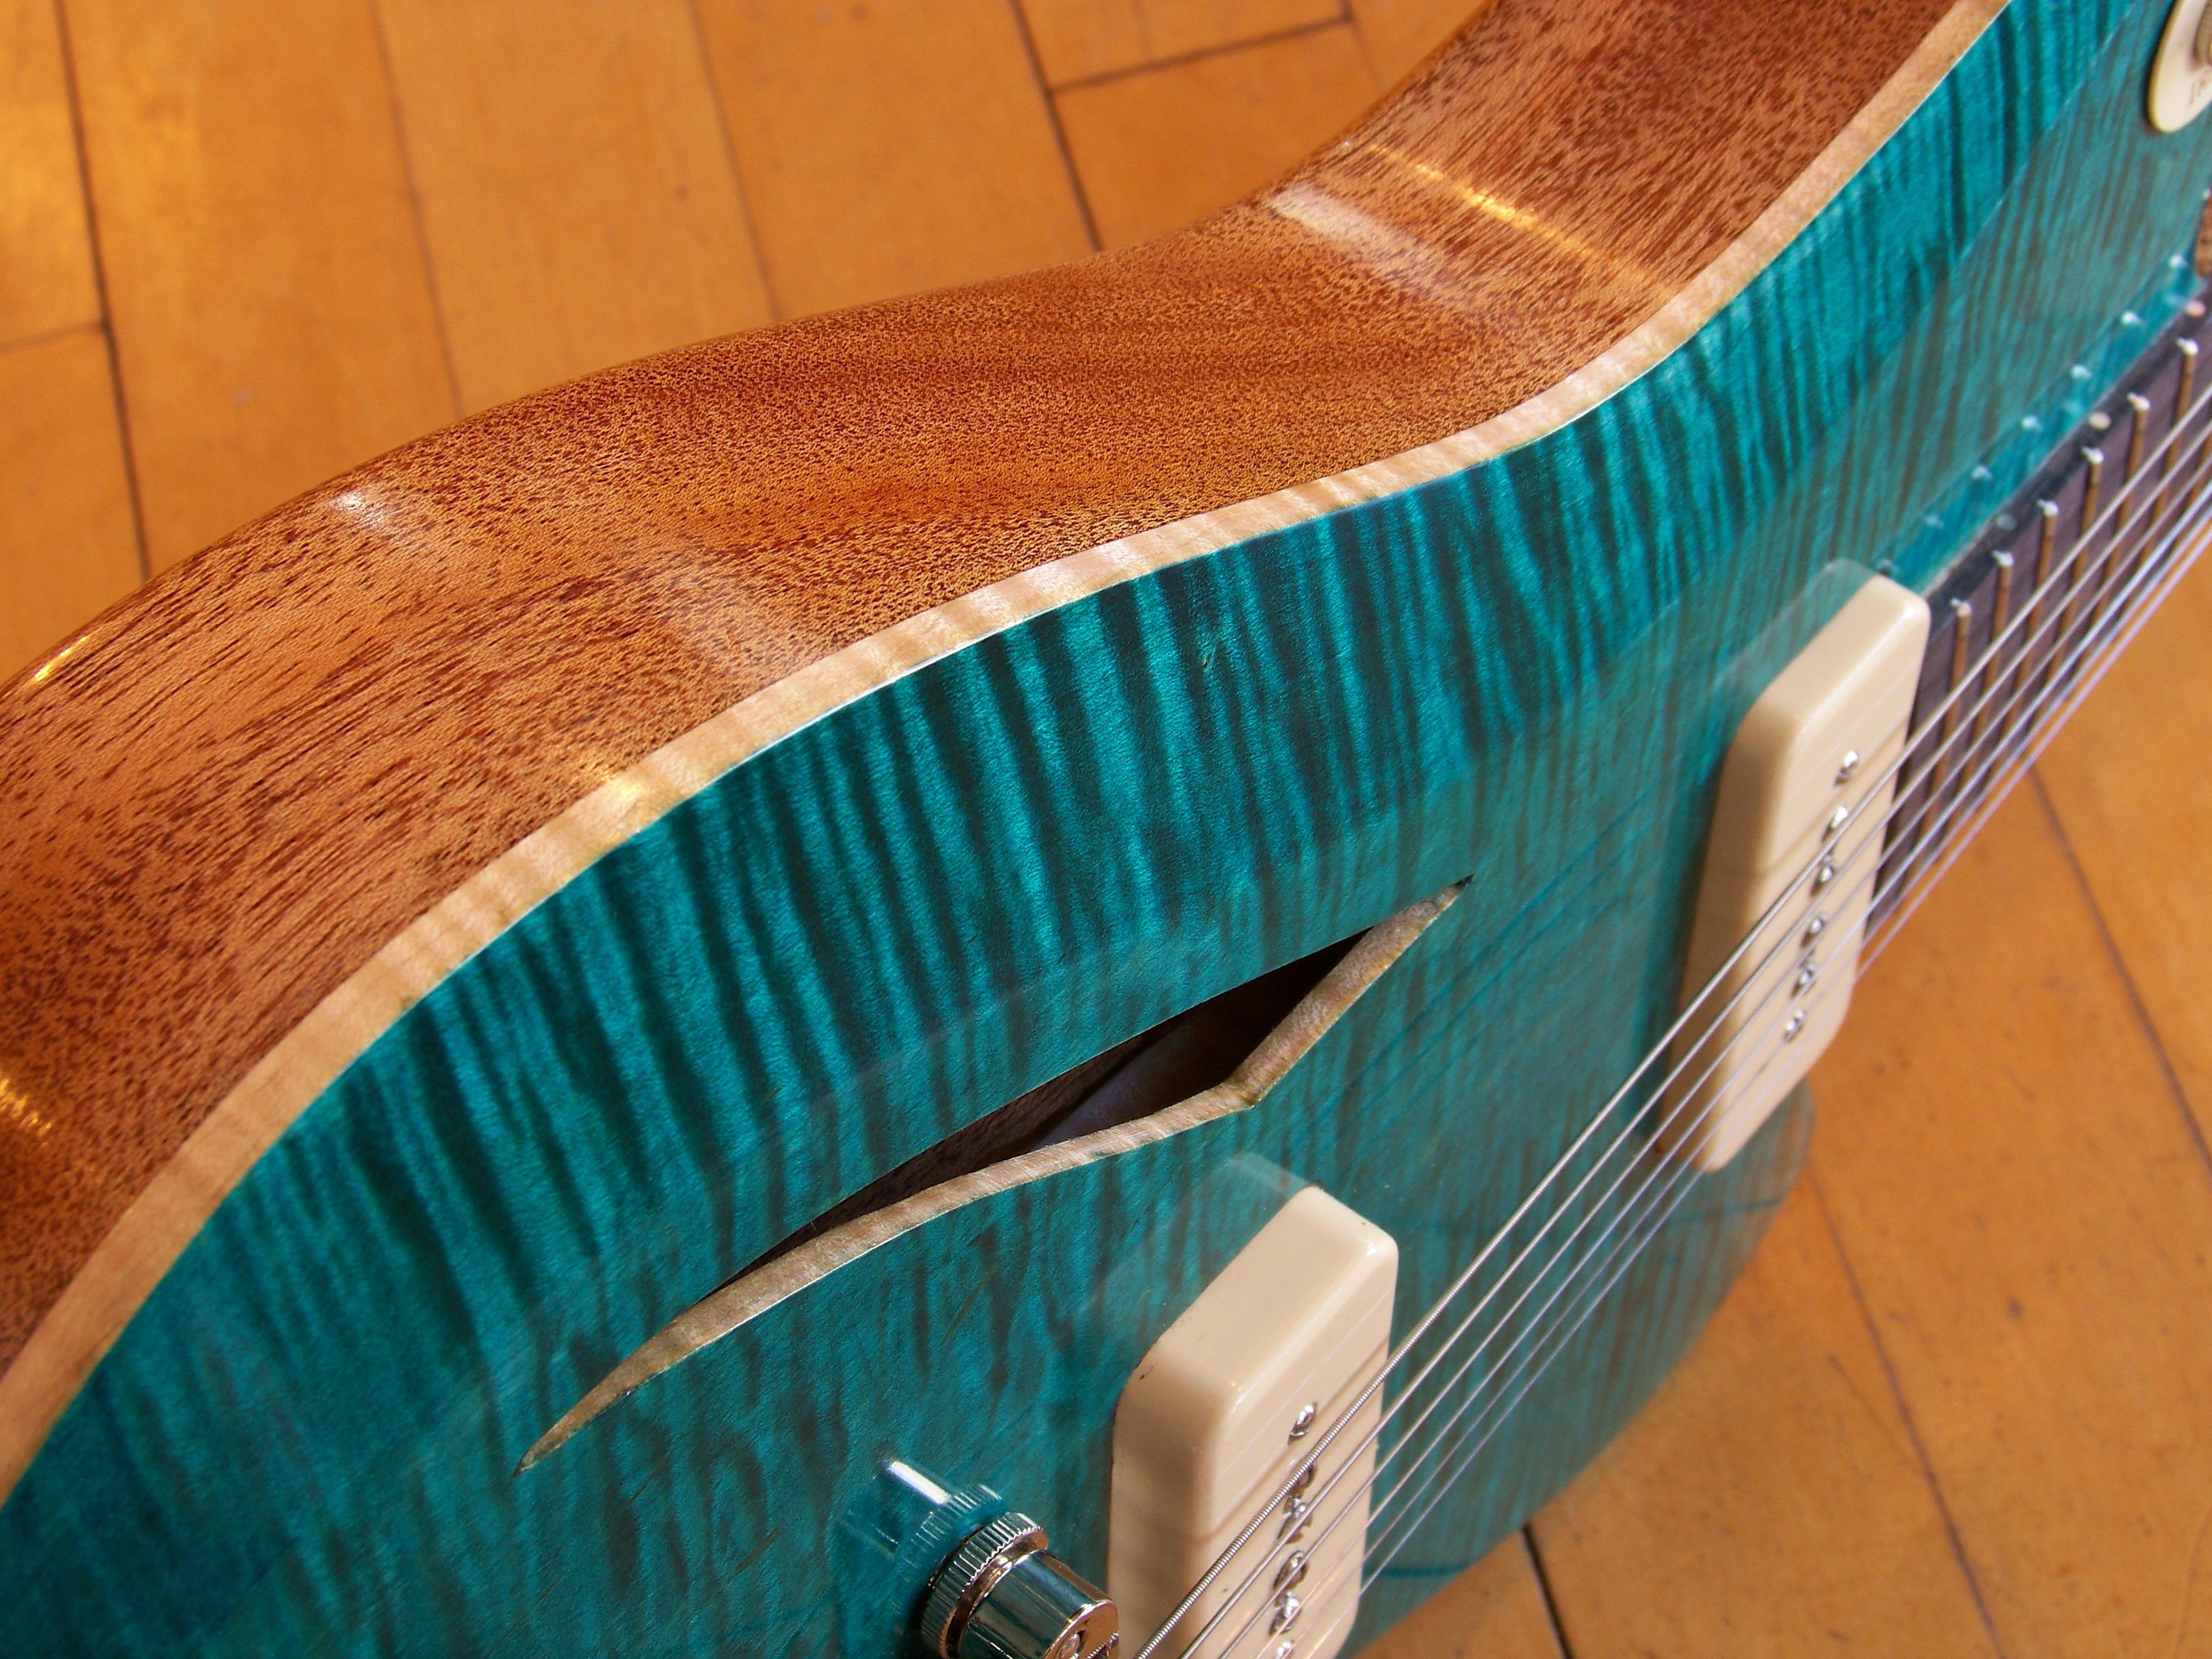 Sehr Gut Kostenlose foto : Flügel, Holz, Gitarre, Stock, Grün, Farbe  OJ59